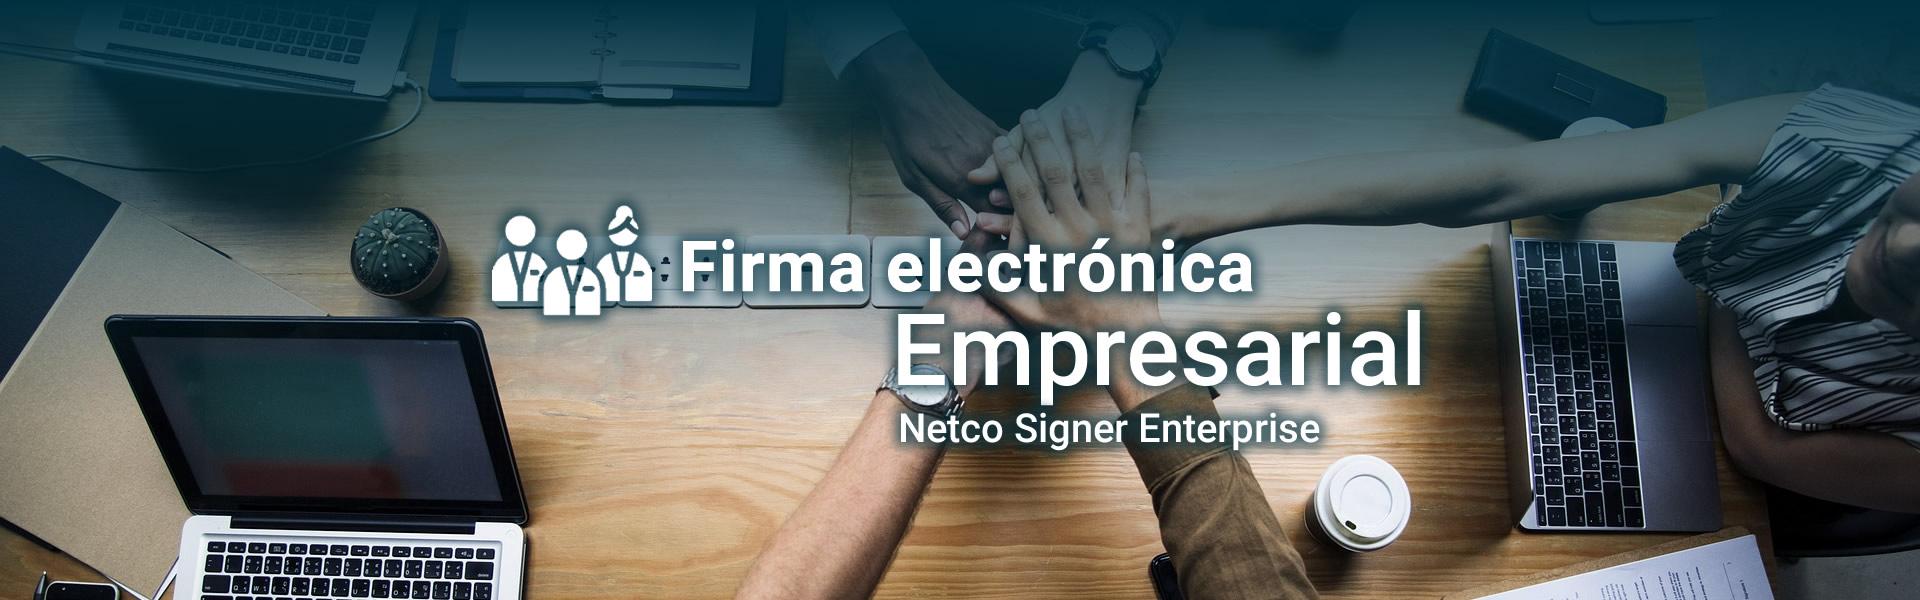 Banner-Firma-electrónica-empresarial.jpg